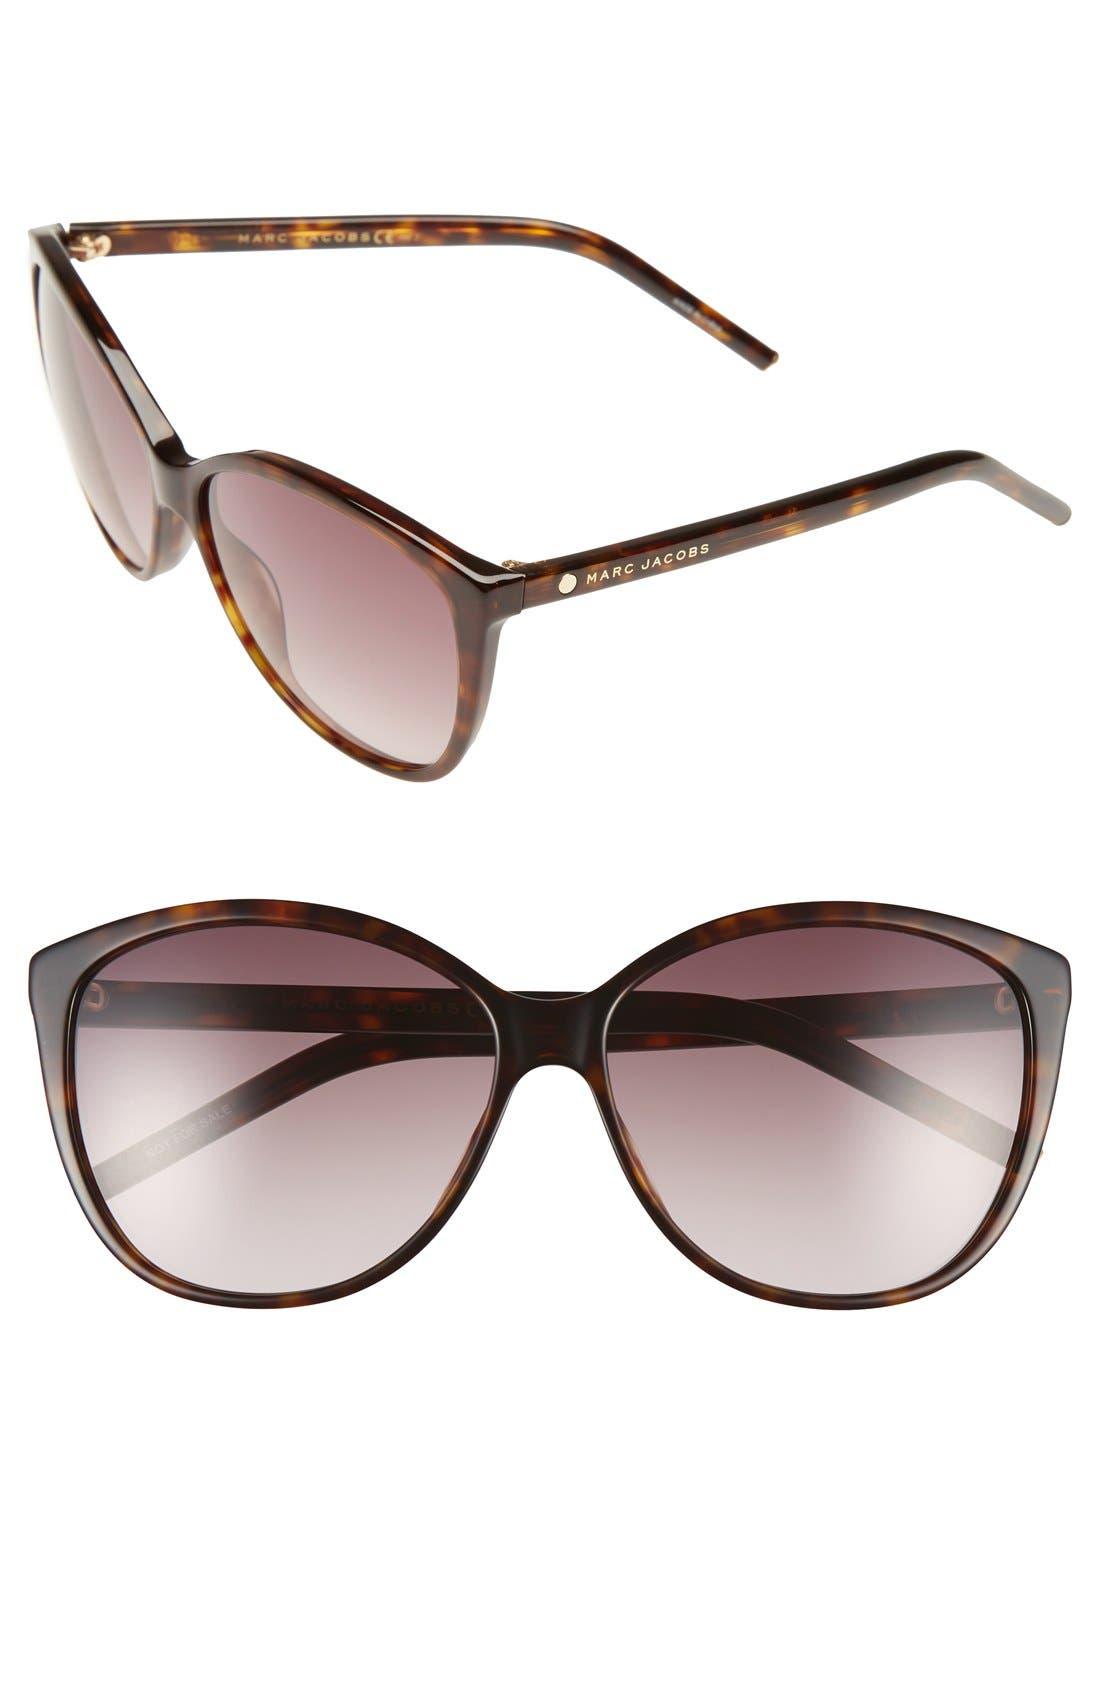 58mm Polarized Butterfly Sunglasses,                         Main,                         color, DARK HAVANA